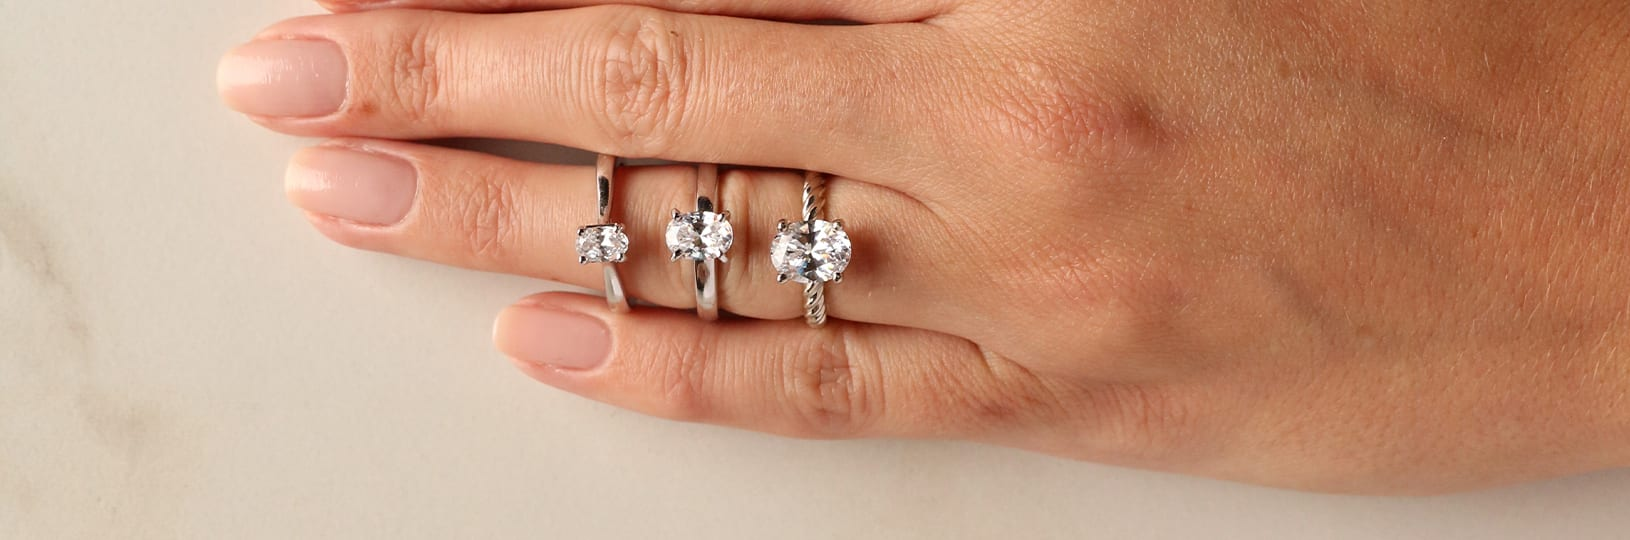 three simple engagement rings